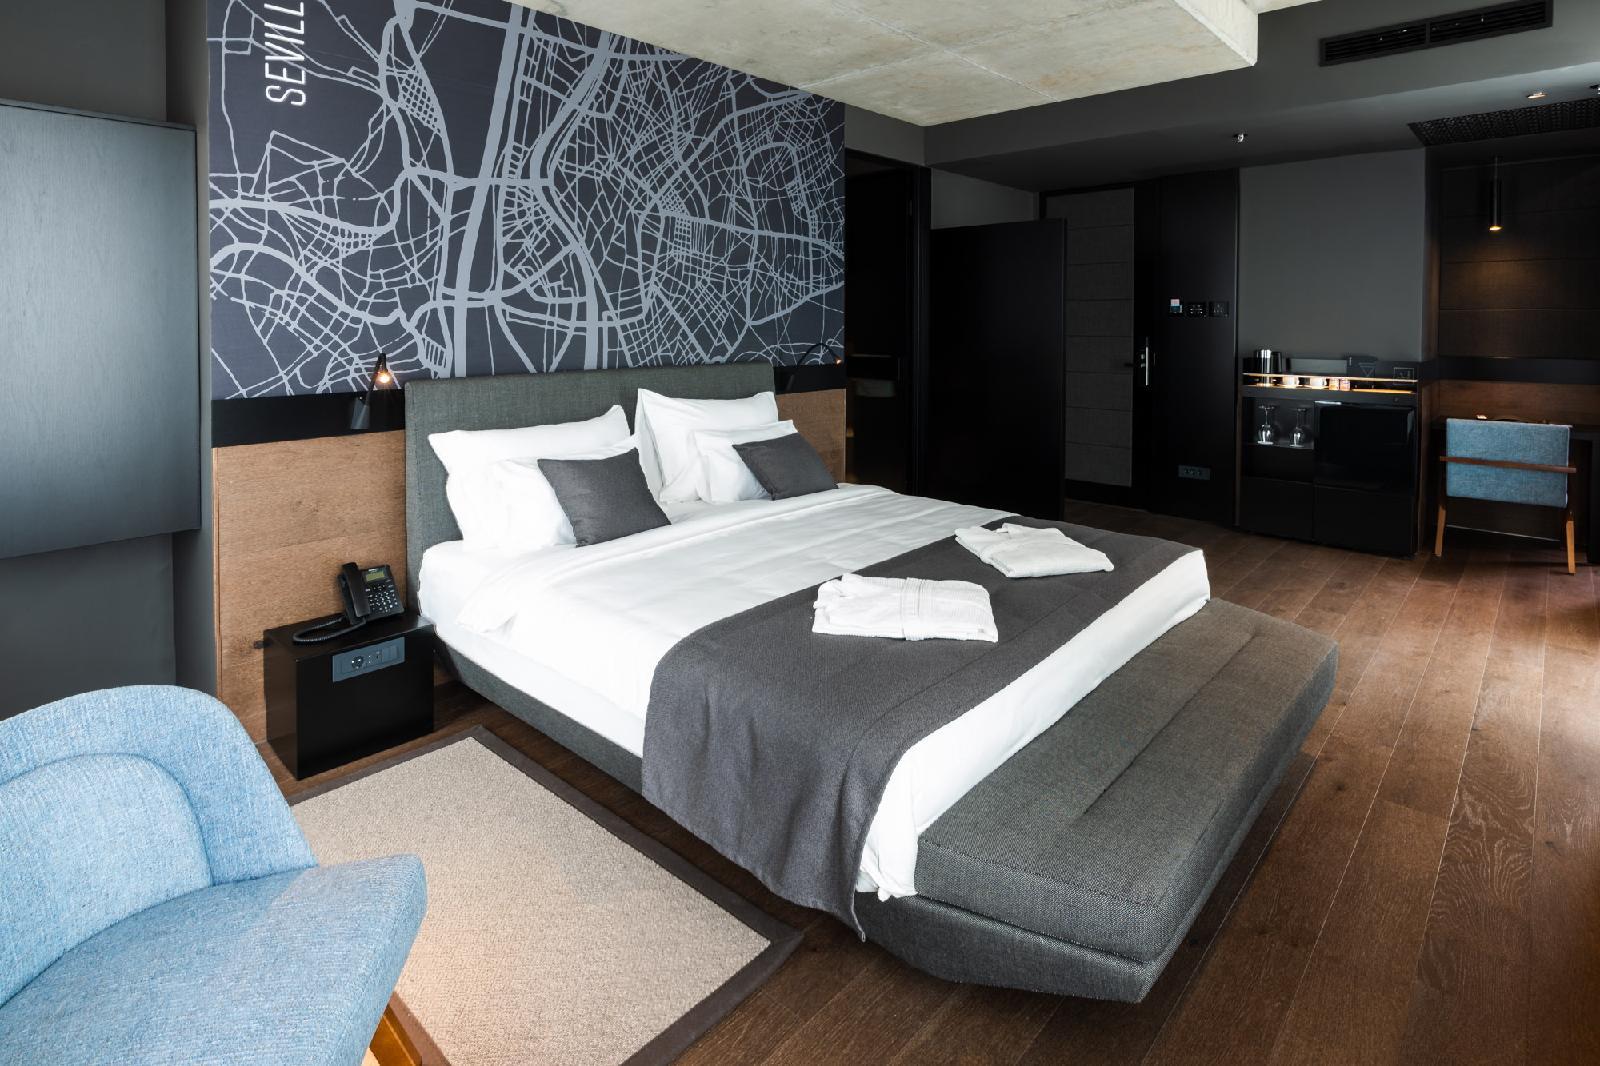 International Business Hotel Image 7